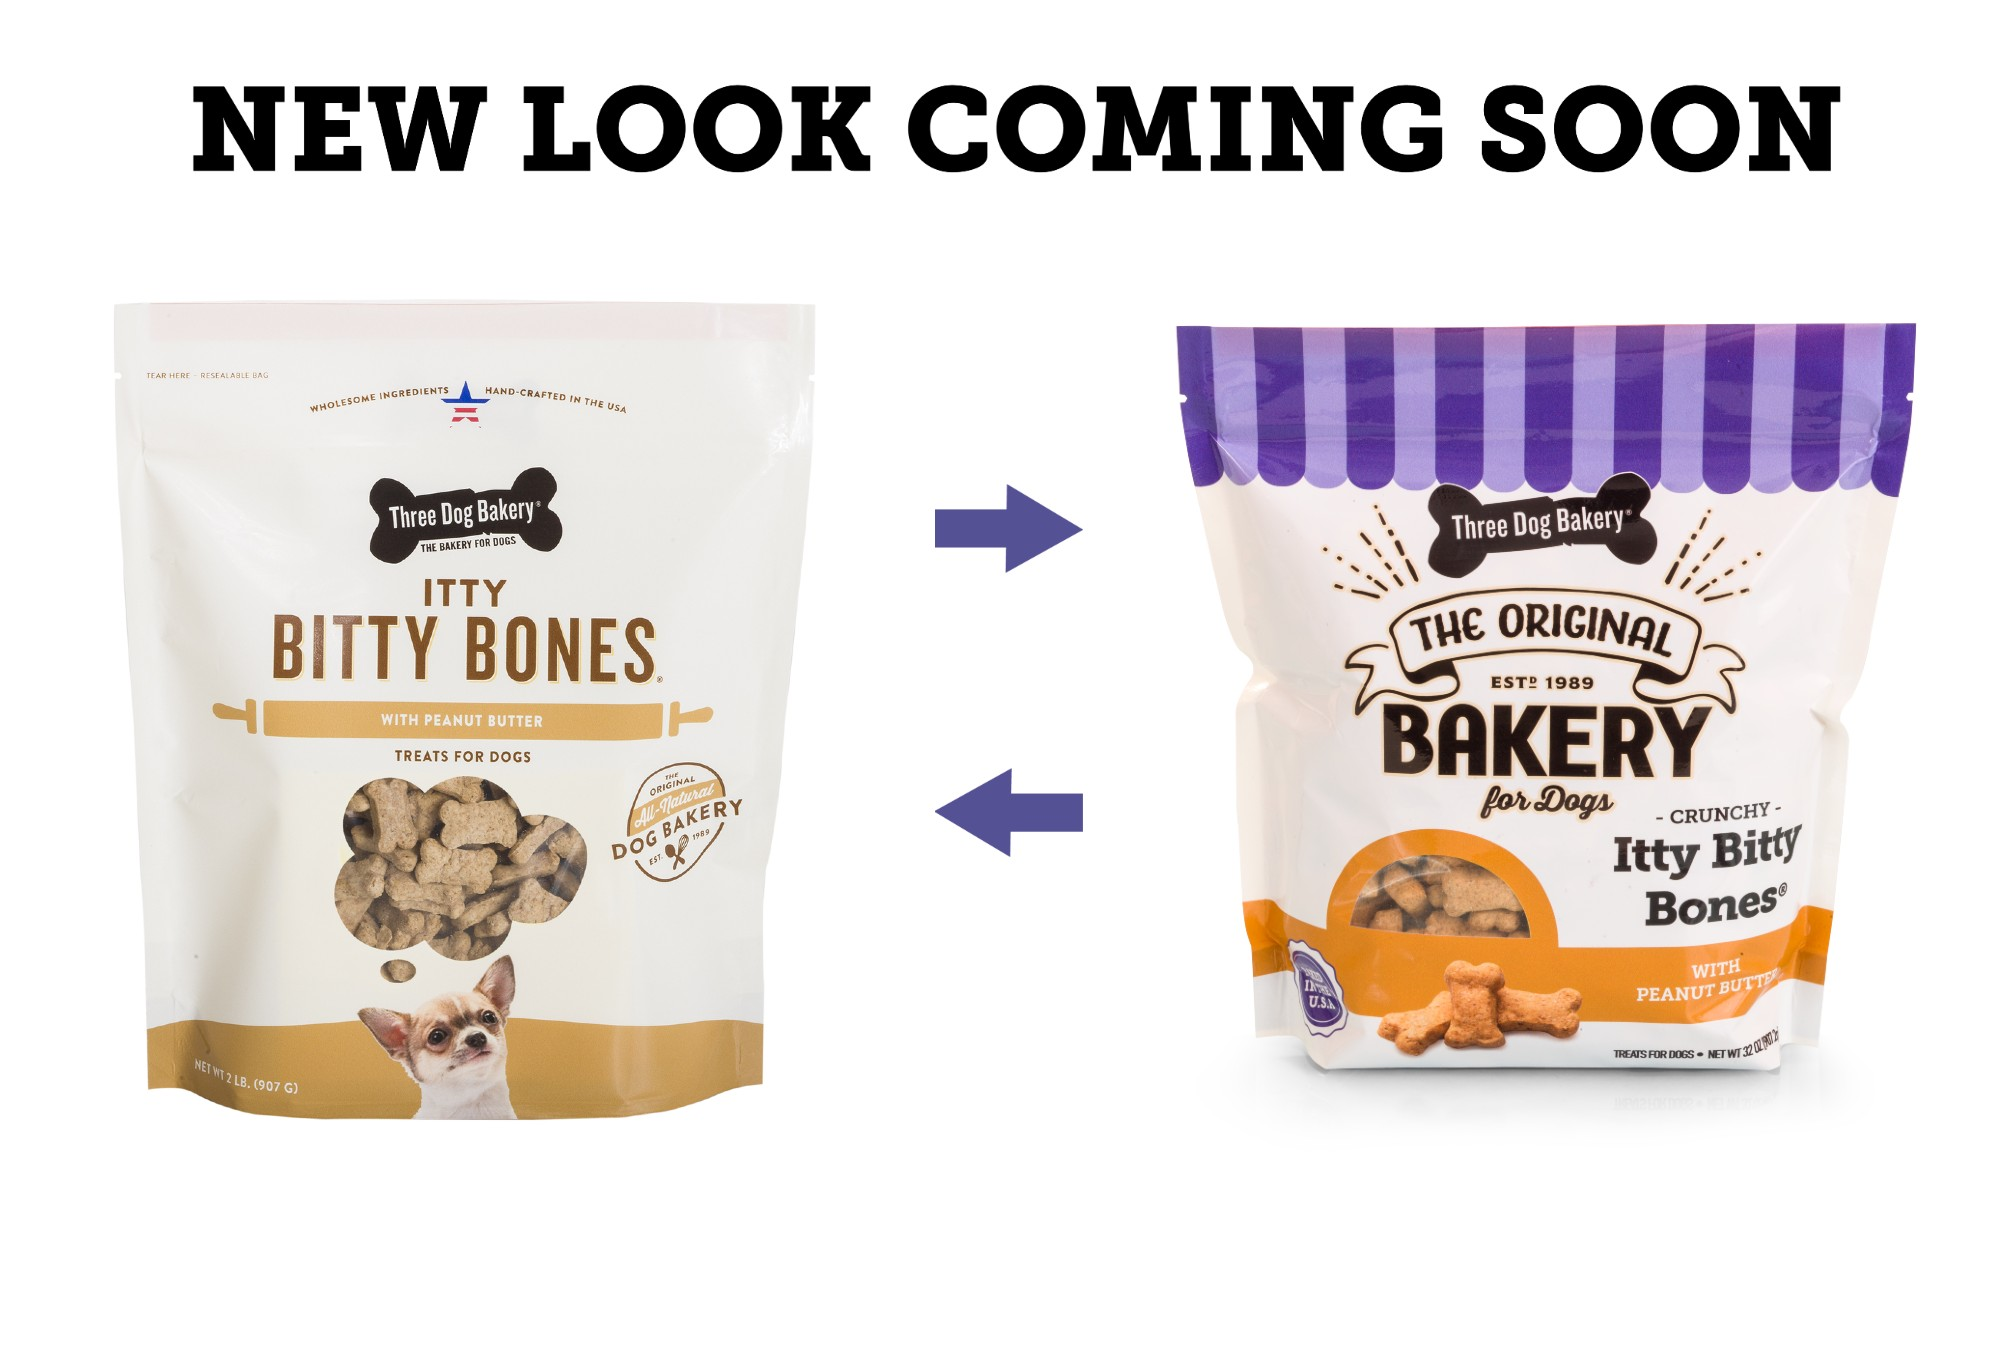 Three Dog Bakery Itty Bitty Bones Peanut Butter Dog Treats, 32-oz